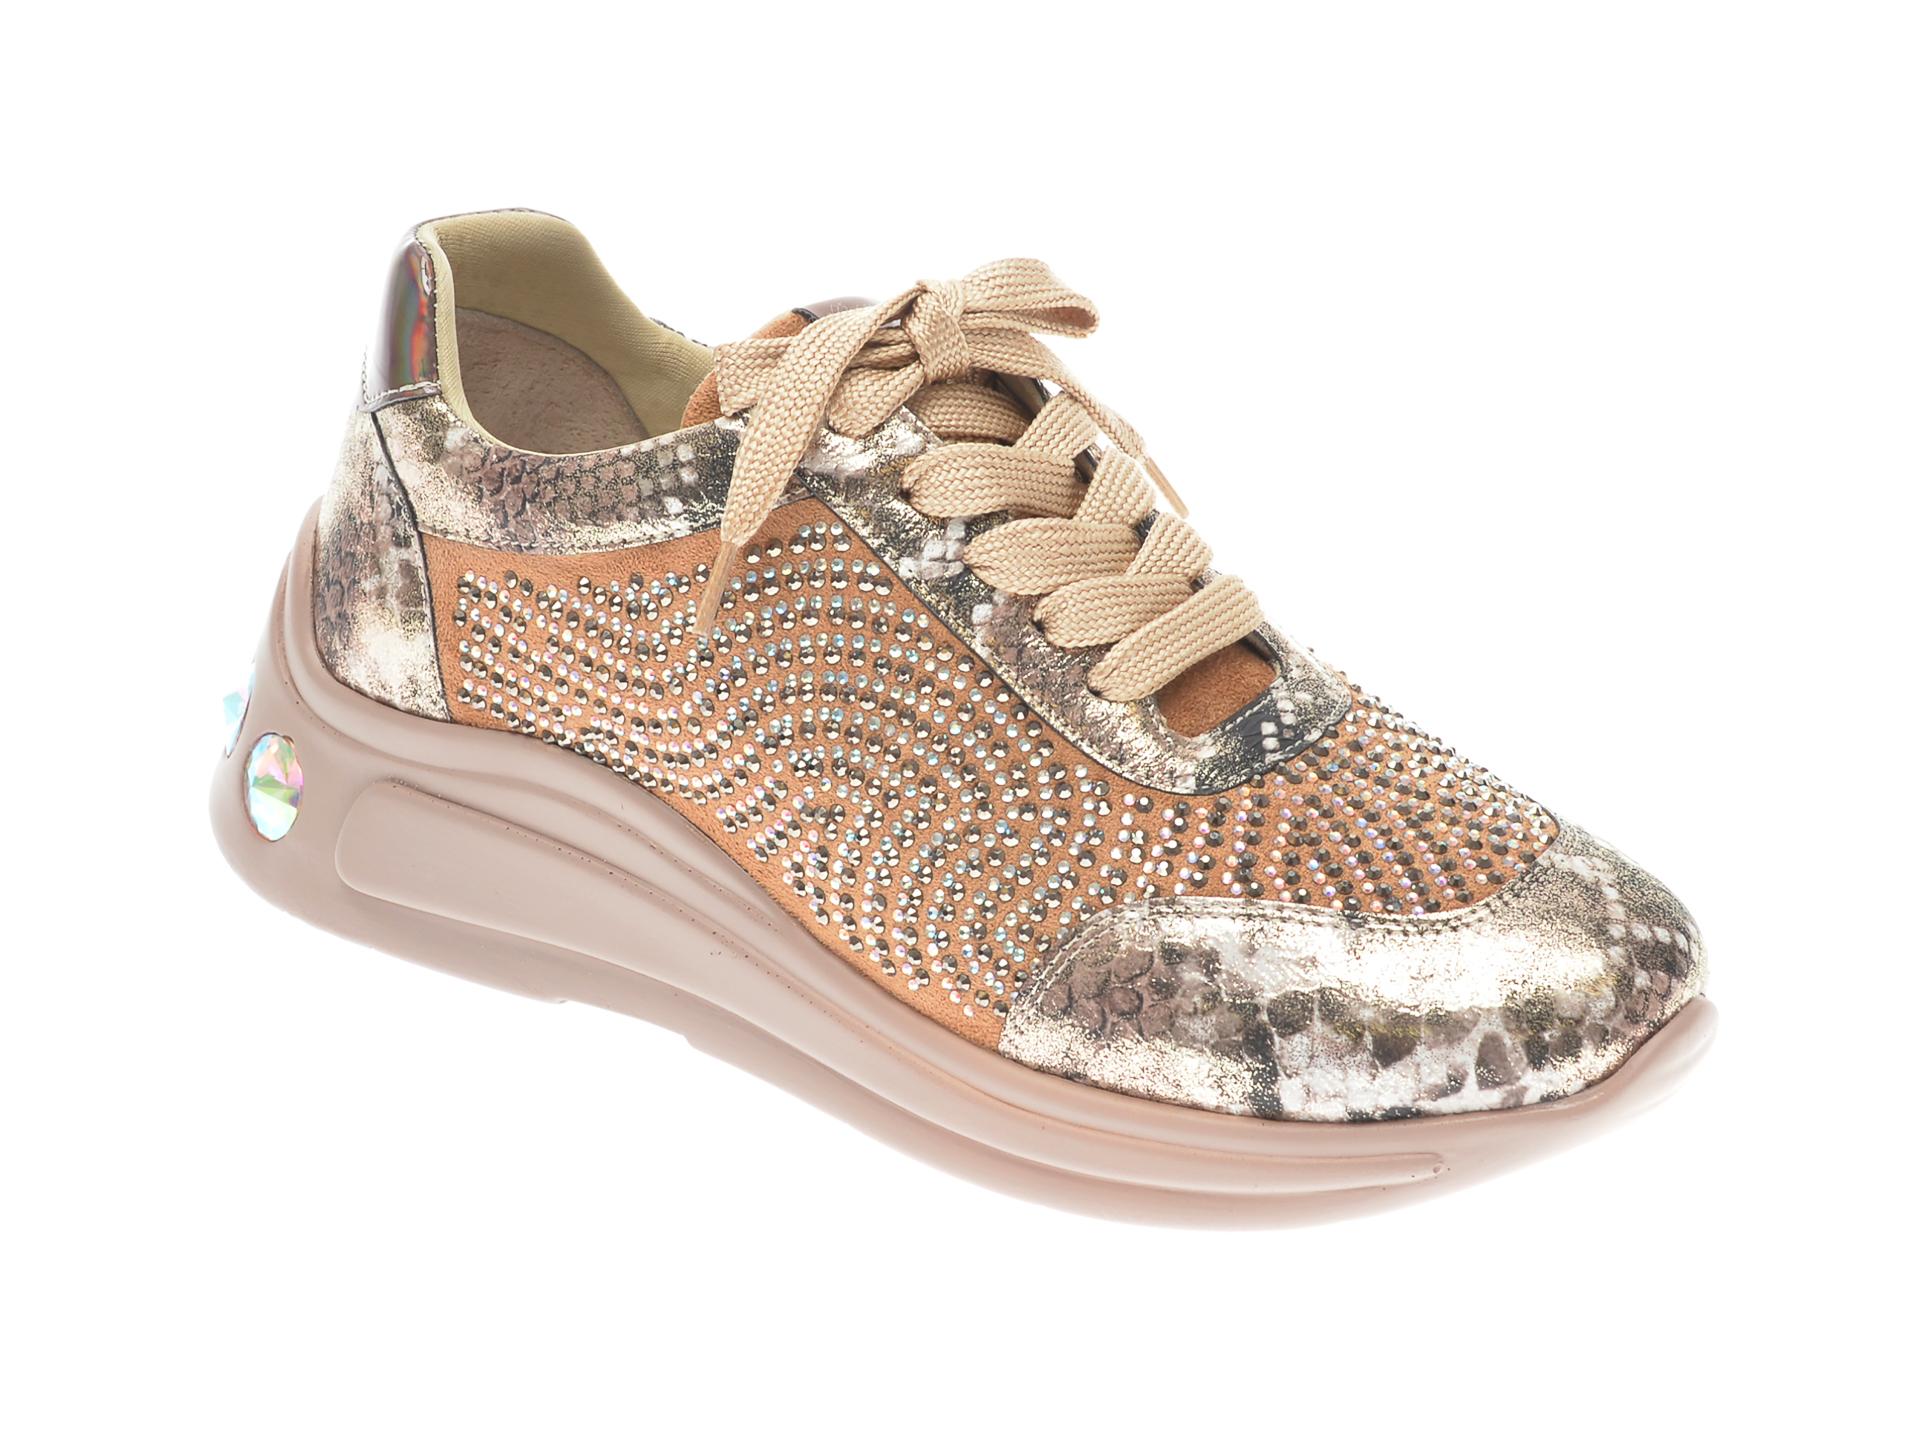 Pantofi sport GRYXX bej, P450, din piele ecologica imagine